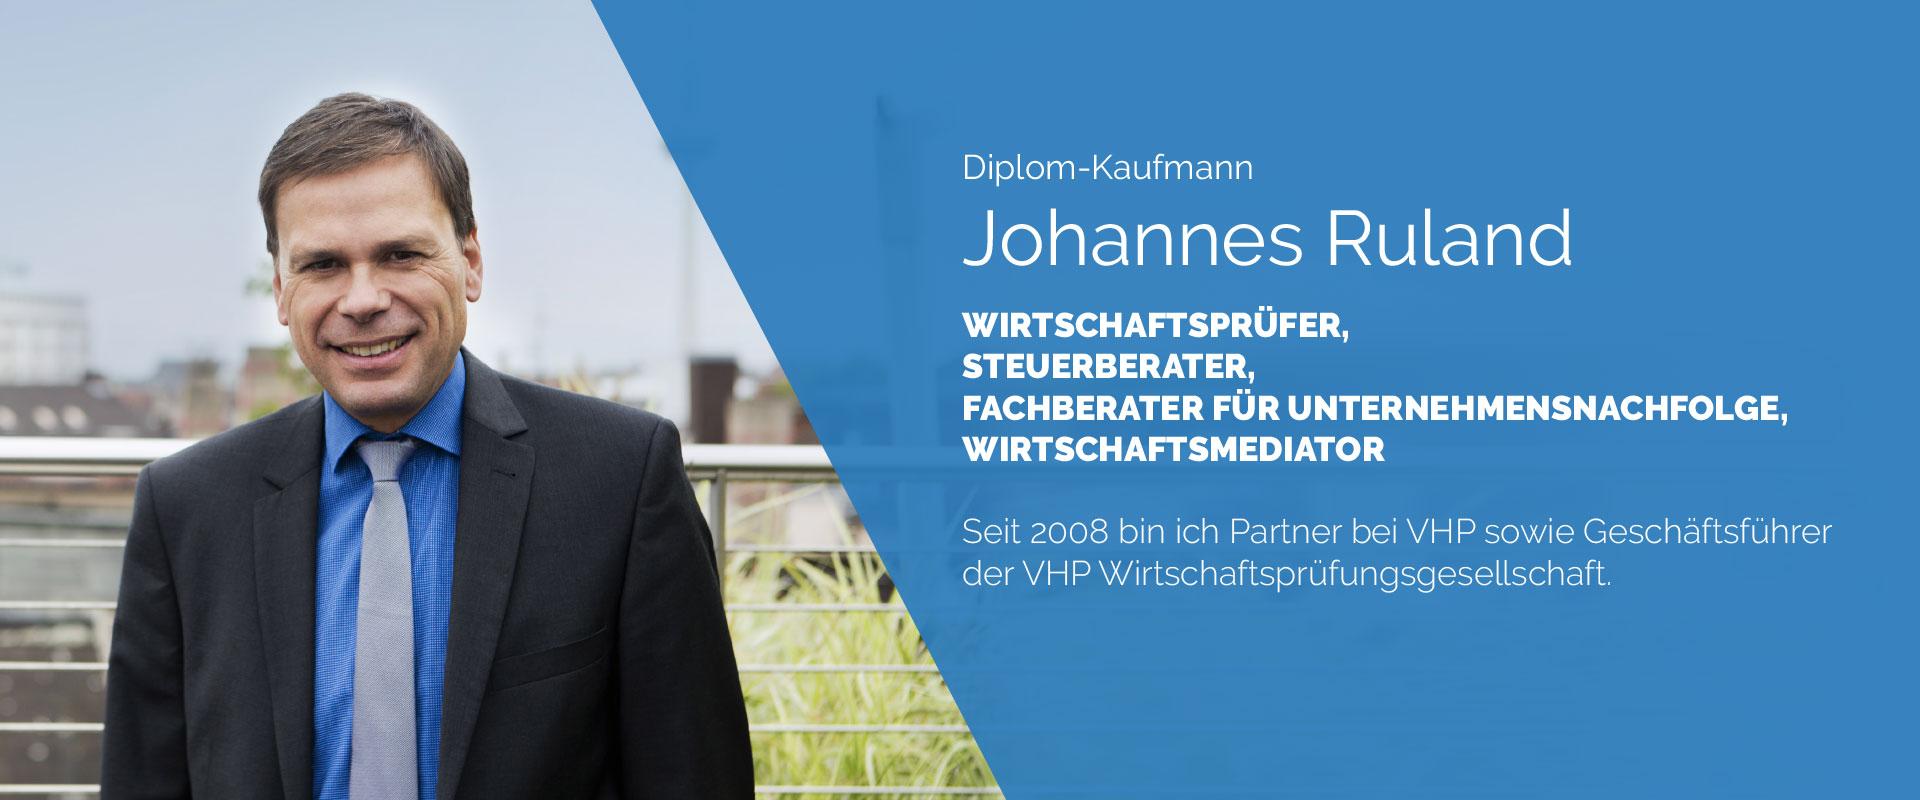 Johannes-Ruland-1